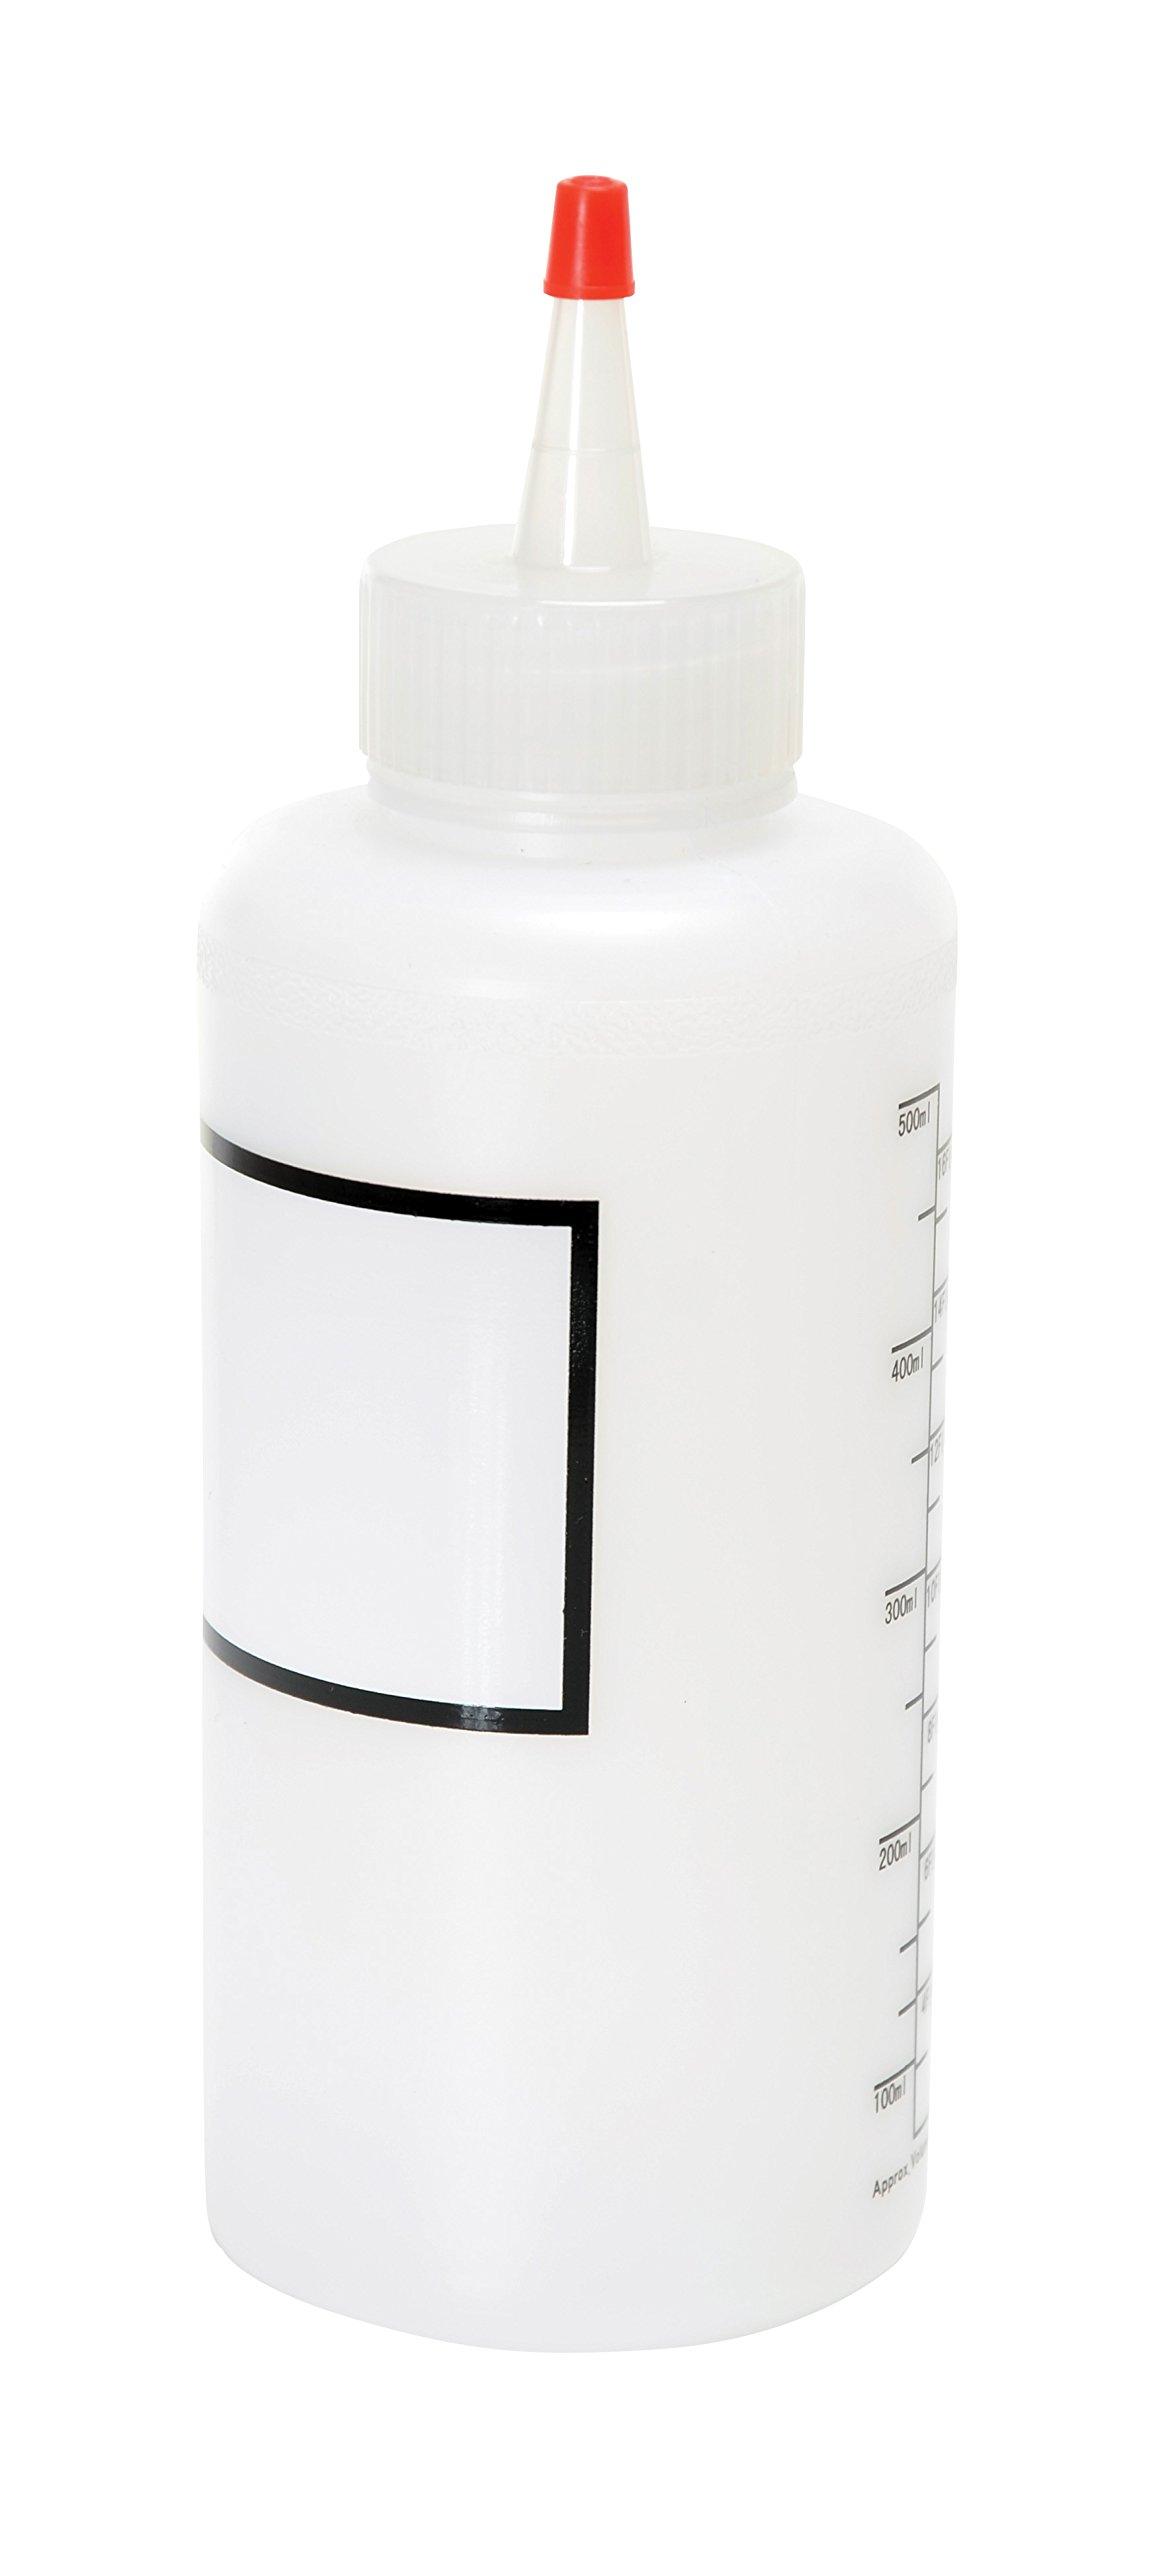 Vestil BTL-RC-16-LBL Low Density Polyethylene (LDPE) Round Graduated Dispensing Bottle with Label and Red Cap, 16 oz Capacity, Translucent